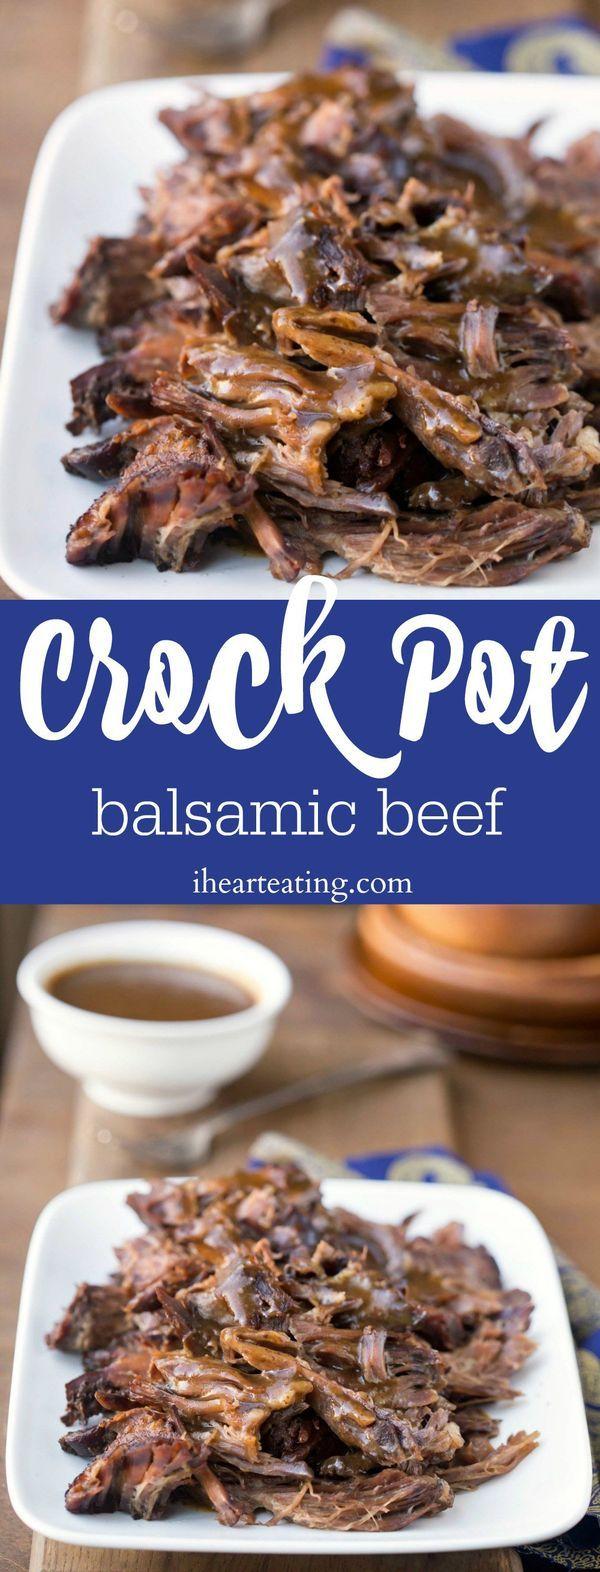 Crock Pot Balsamic Beef Recipe - easy slow cooker roast dinner recipe! So tasty!